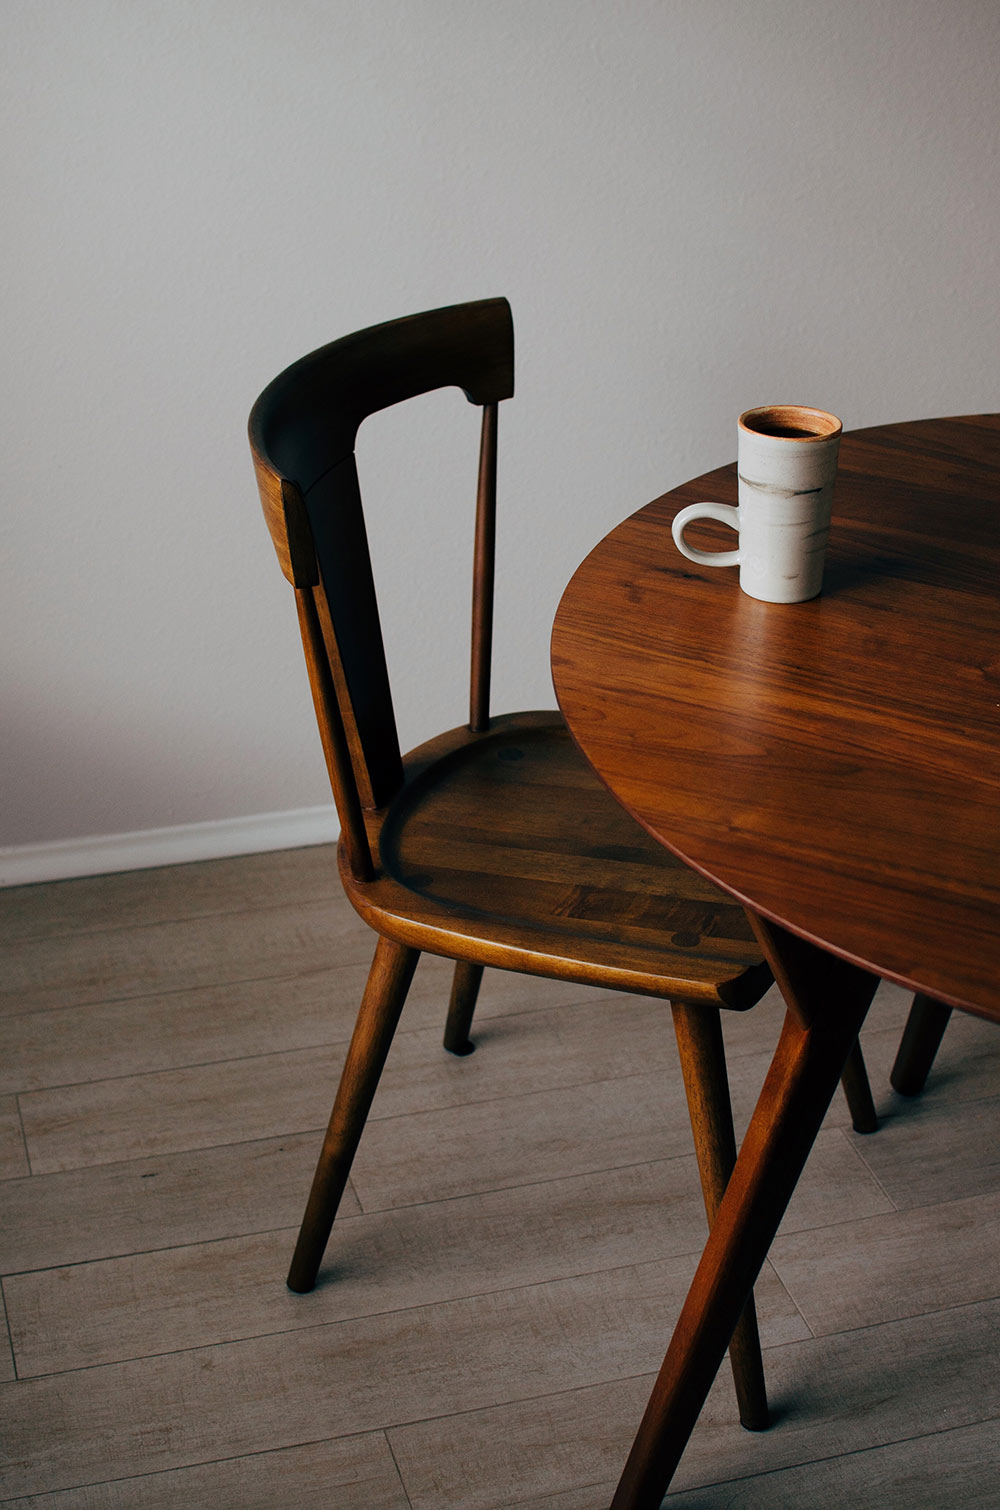 Gu a para limpiar muebles de madera natural megamobiliario - Muebles de madera natural ...